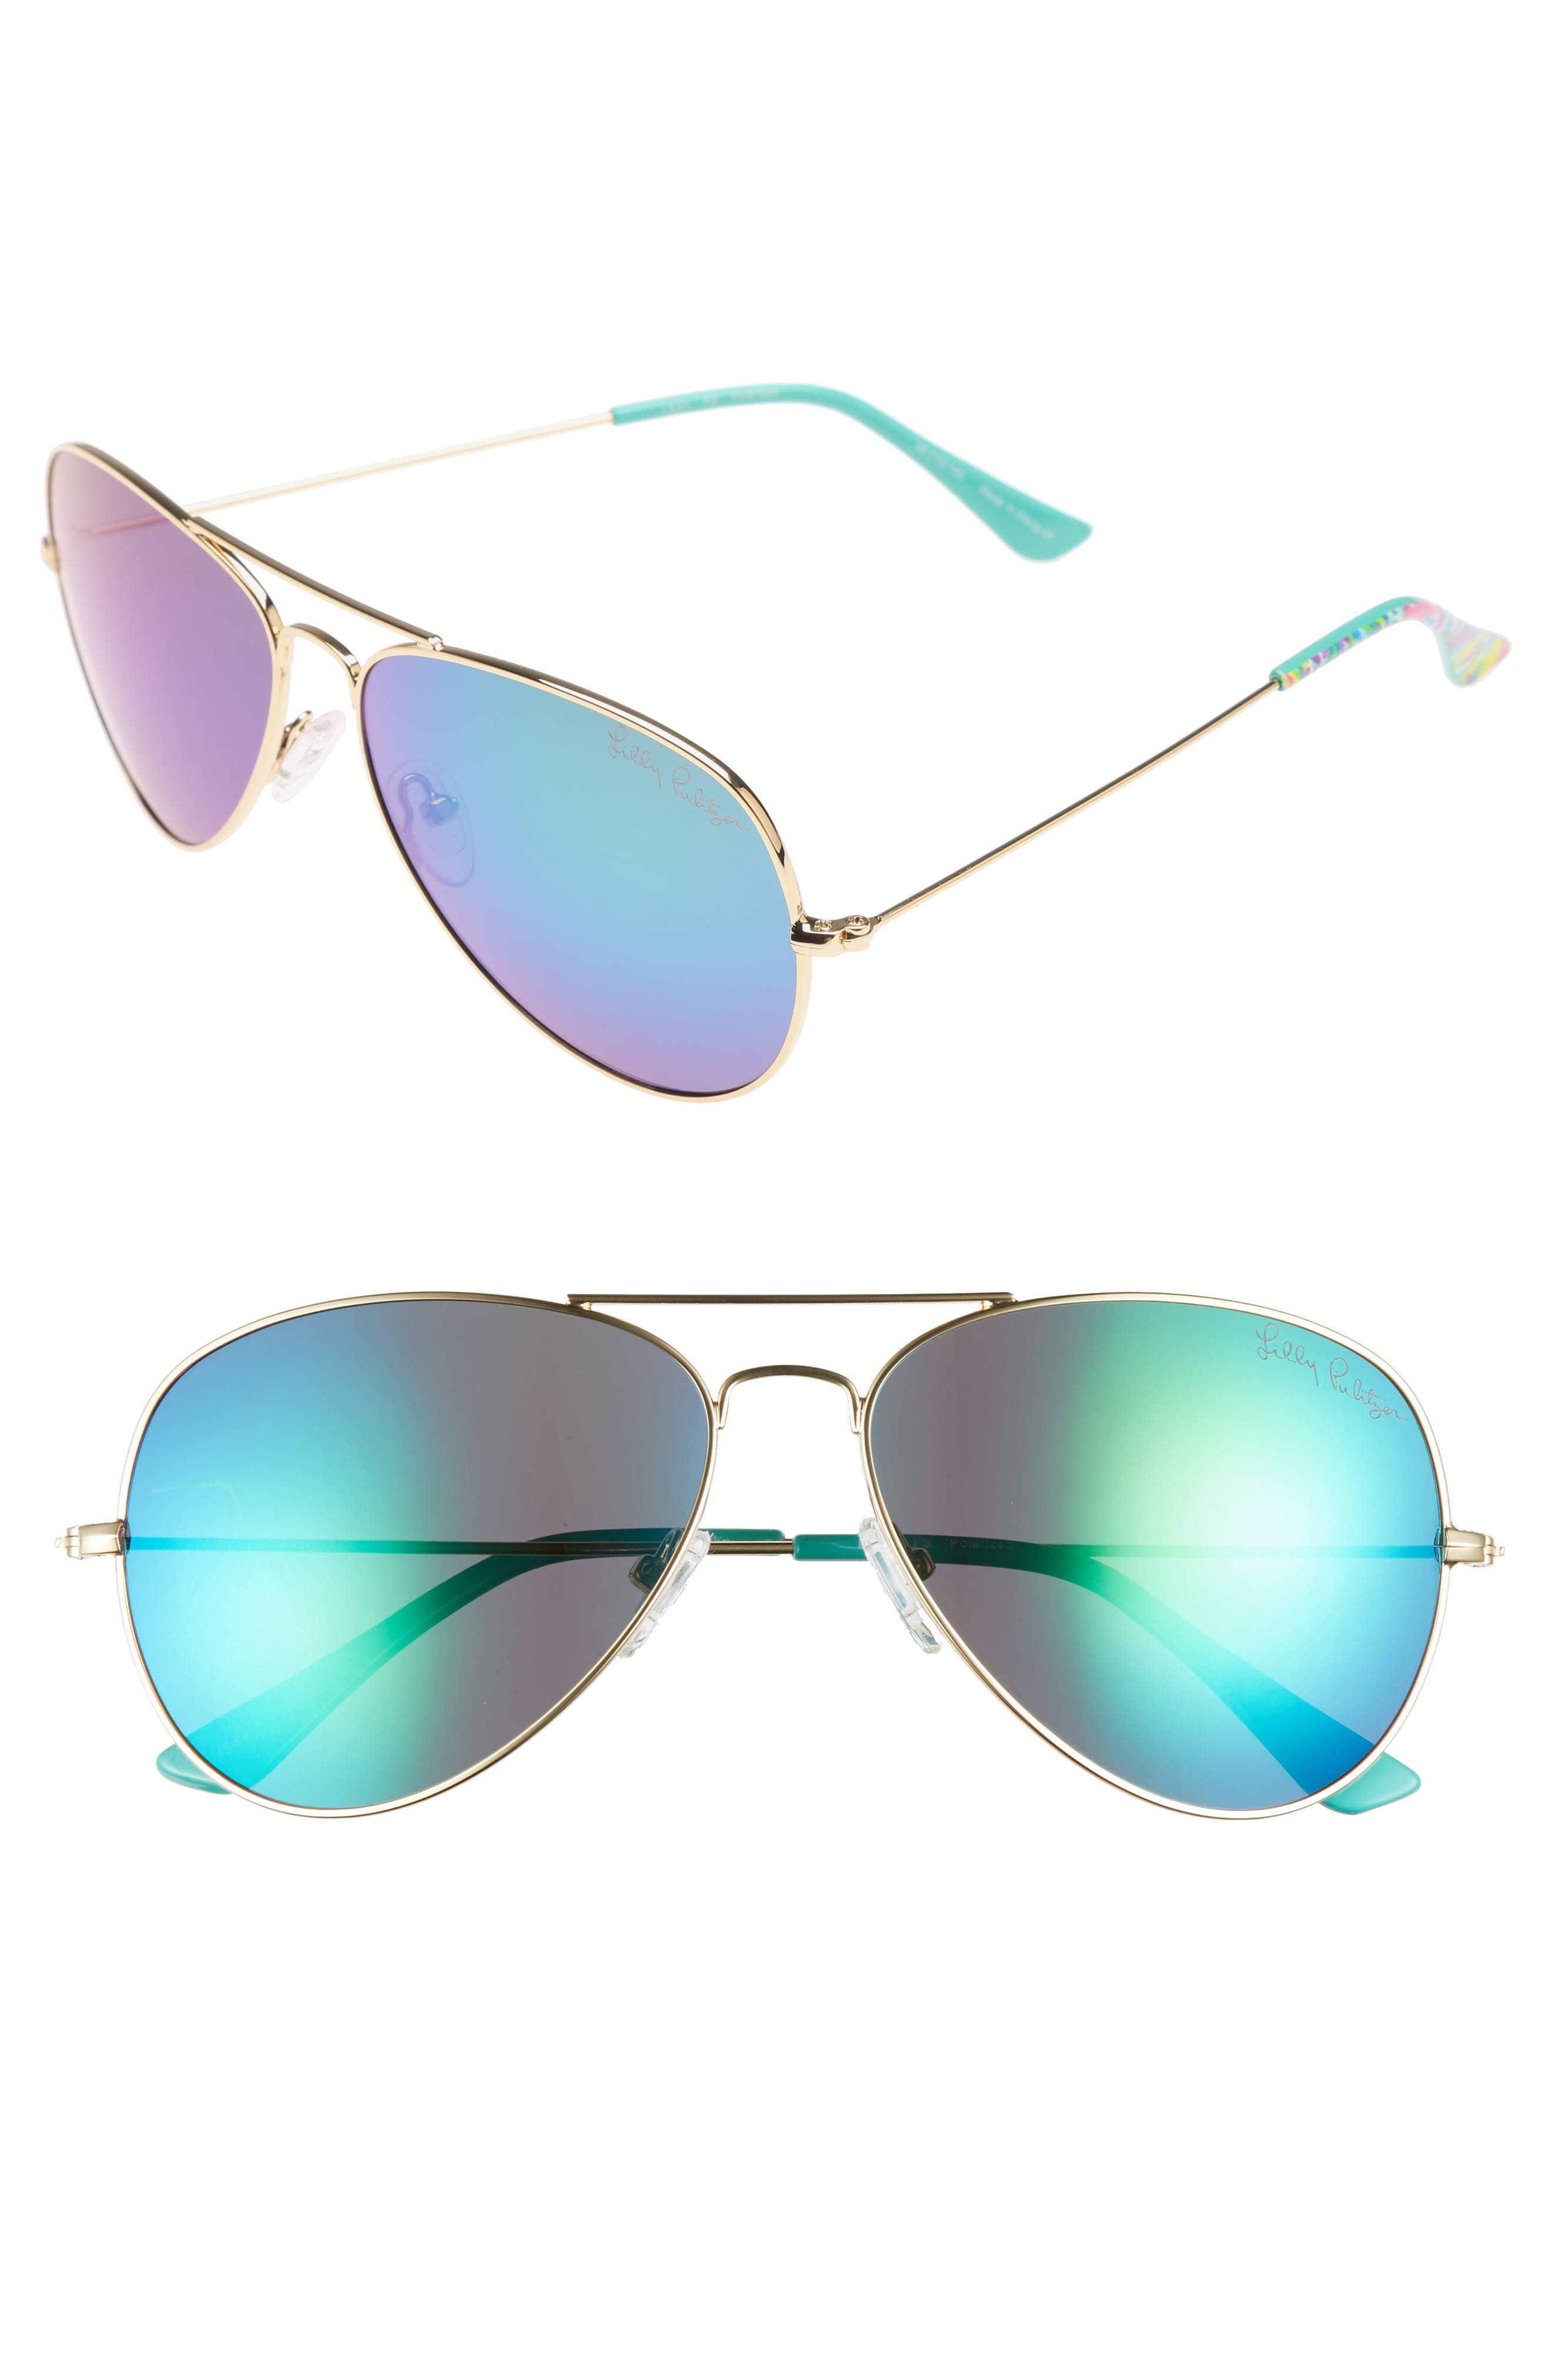 Lilly Pulitzer Lexy 5m Polarized Aviator Sunglasses - Blue